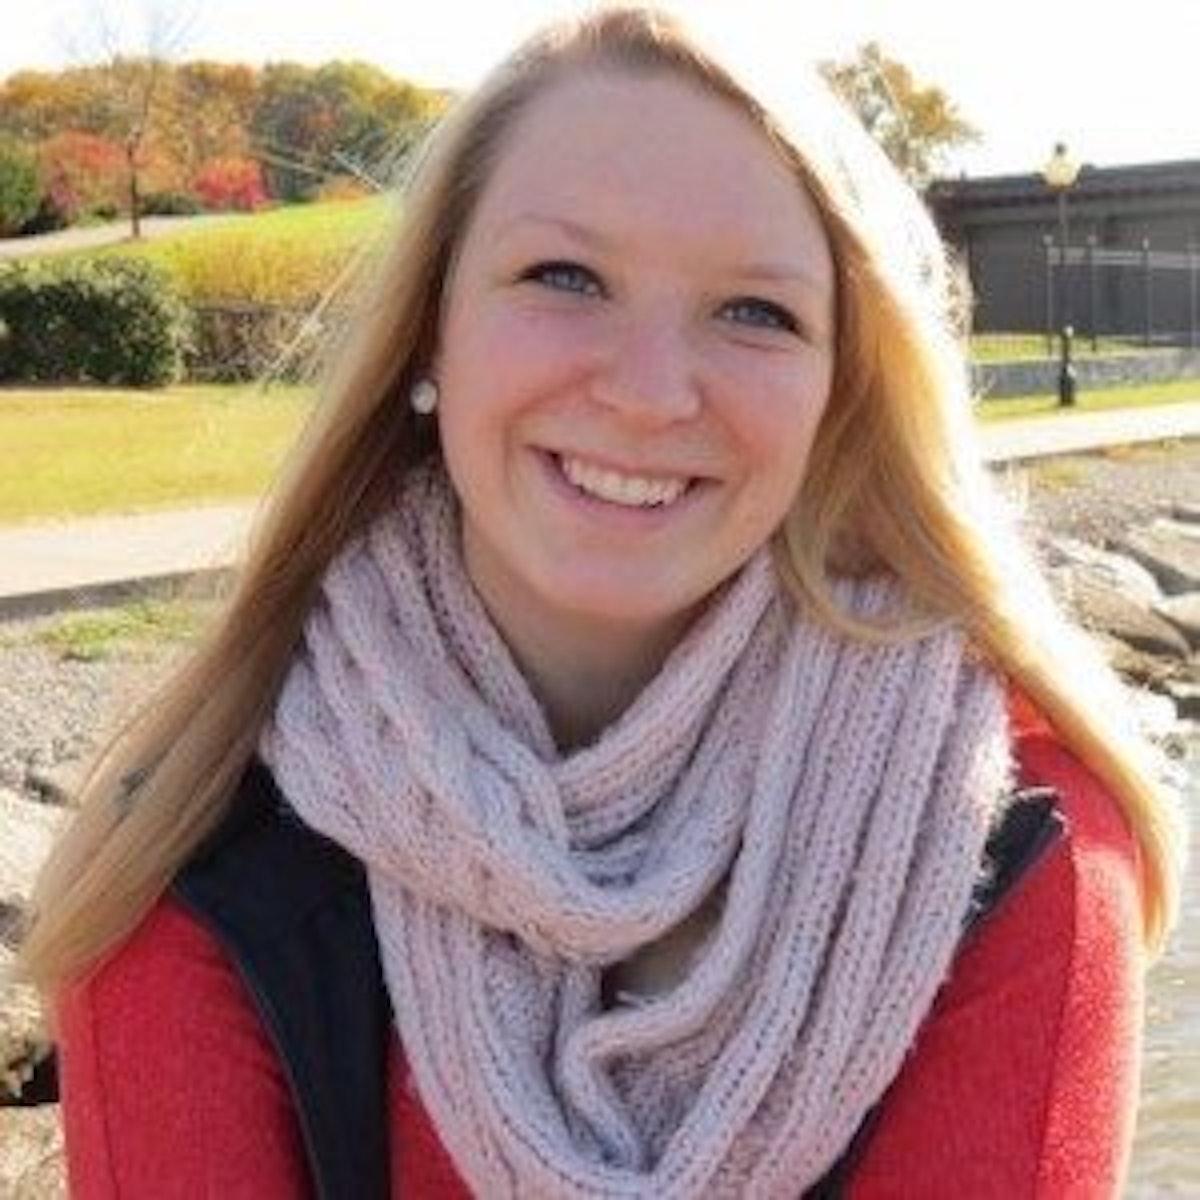 Katie Wilhelm